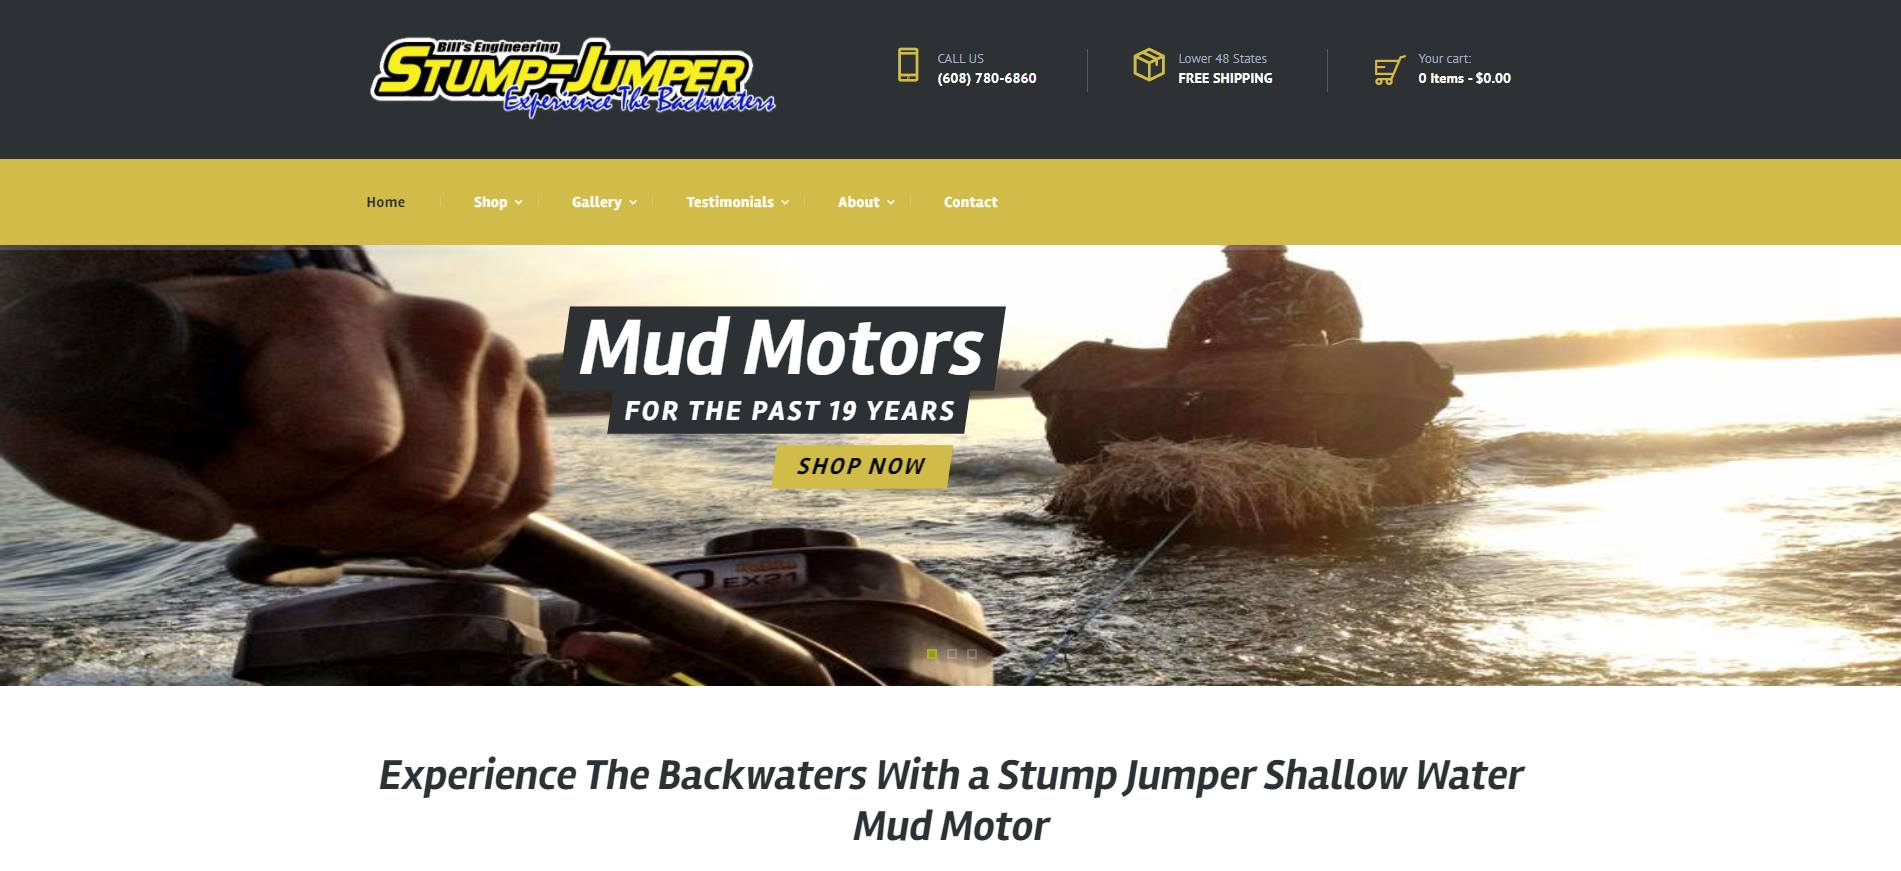 Stump-Jumper Mud Motors - Most Reliable Mud Motor in the